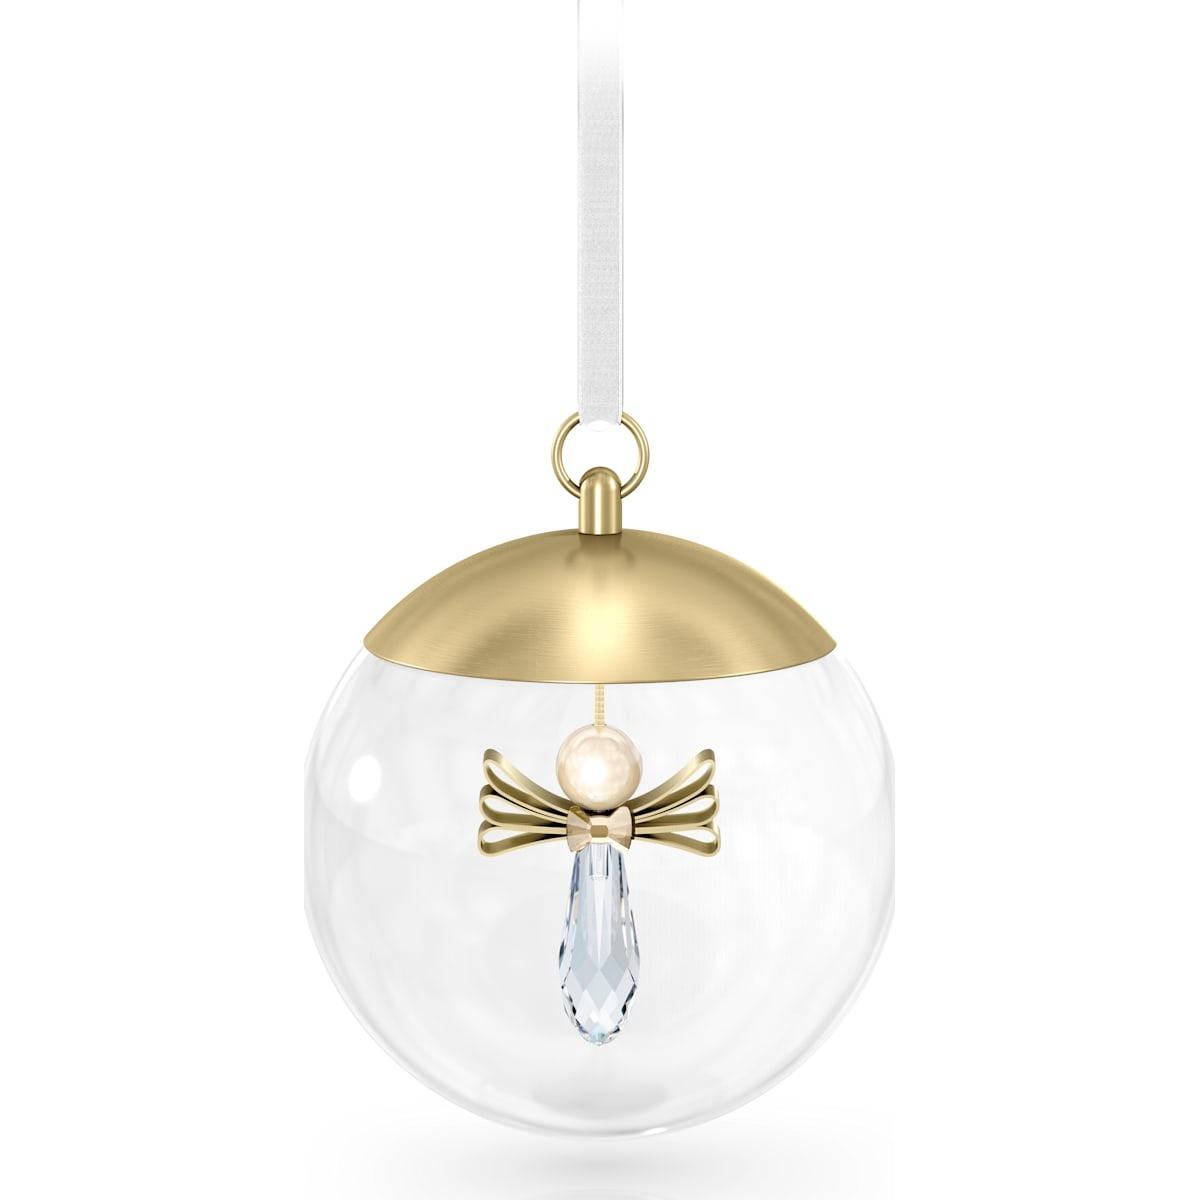 Swarovski Swarovski ornament Holiday Magic 5596404